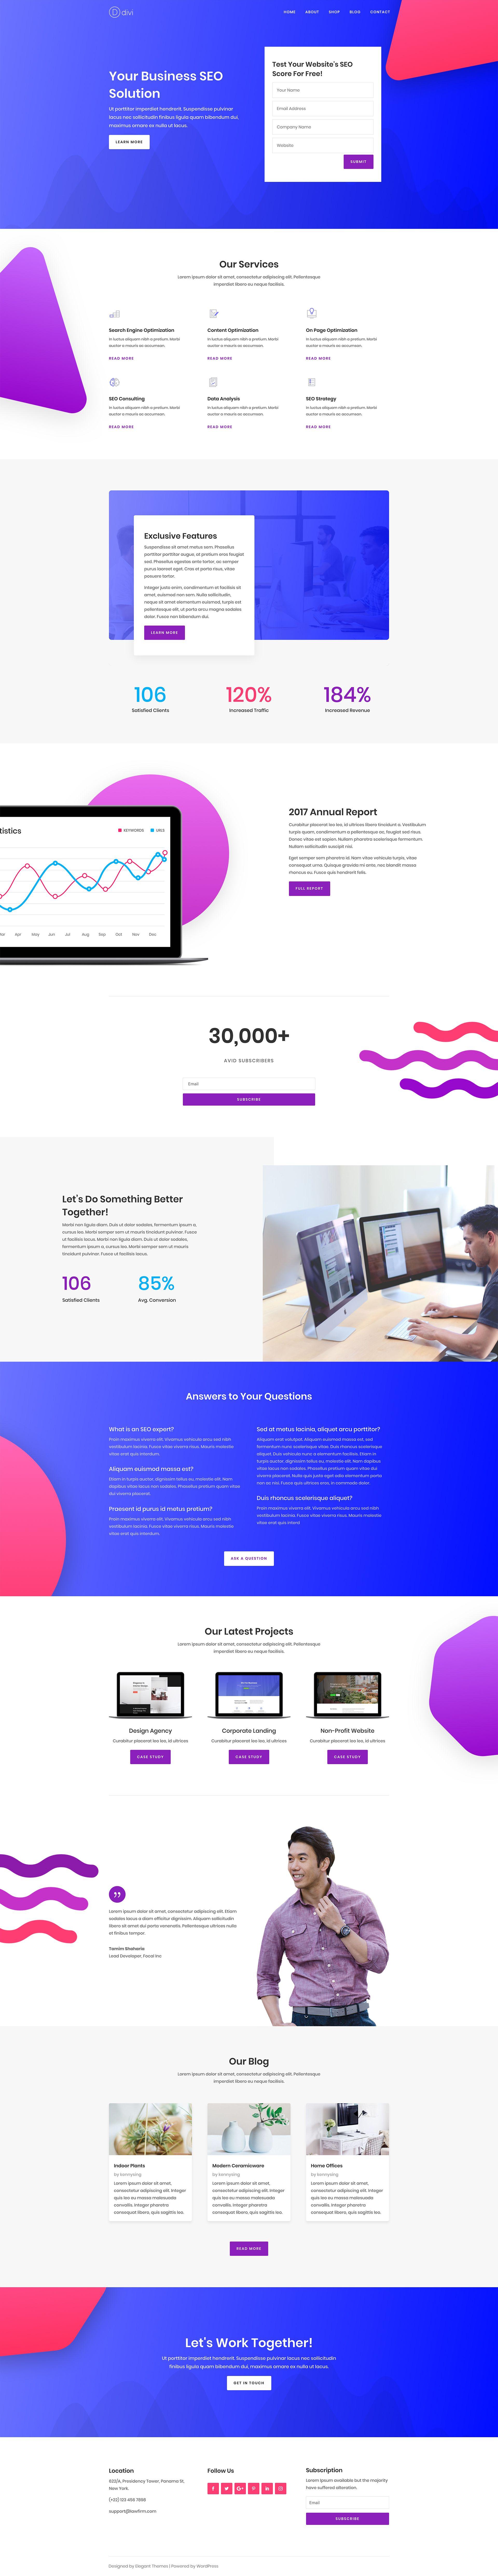 Seo Landing Best Web Design Small Business Web Design Web Layout Design